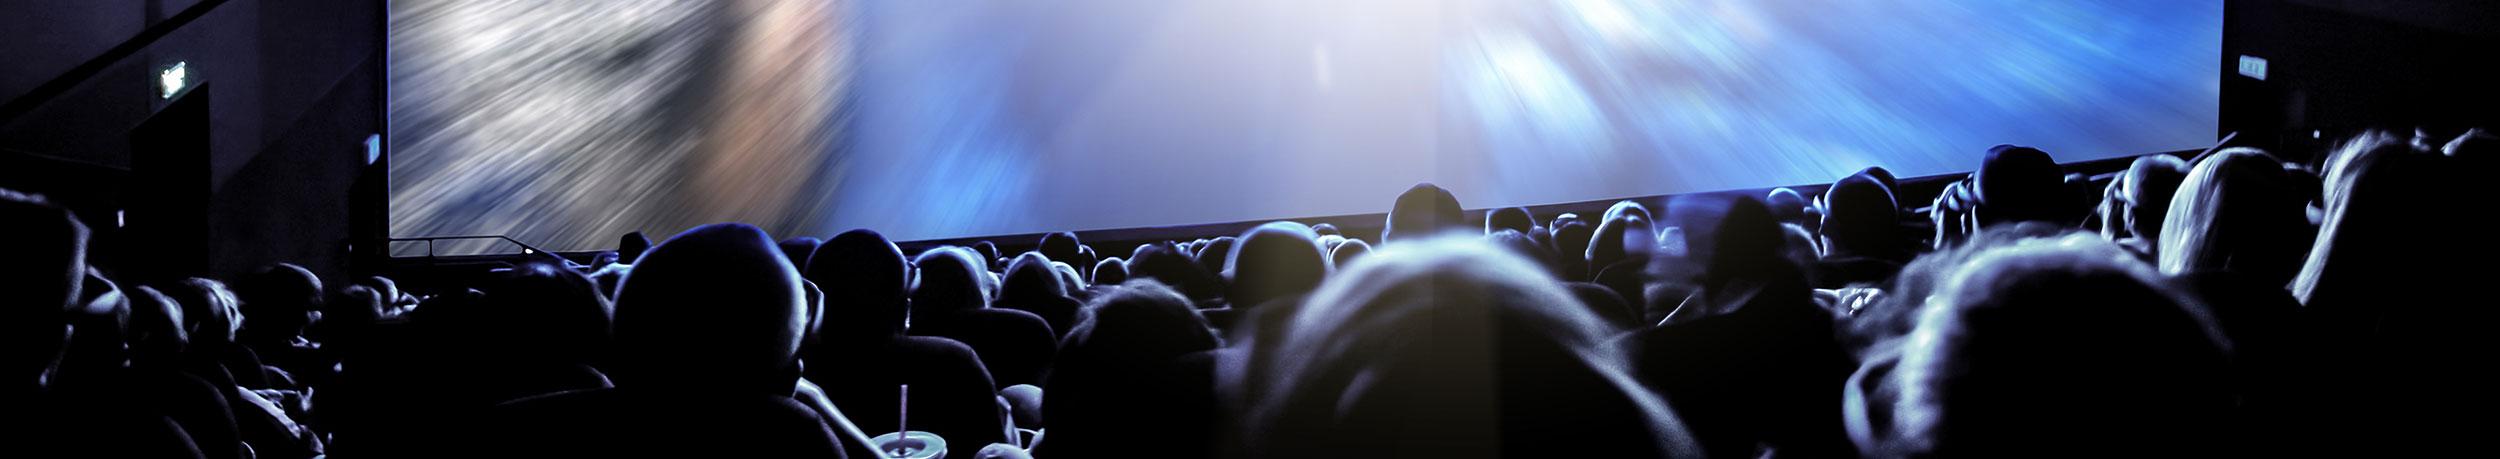 itvmedia-pagina-bioscoop